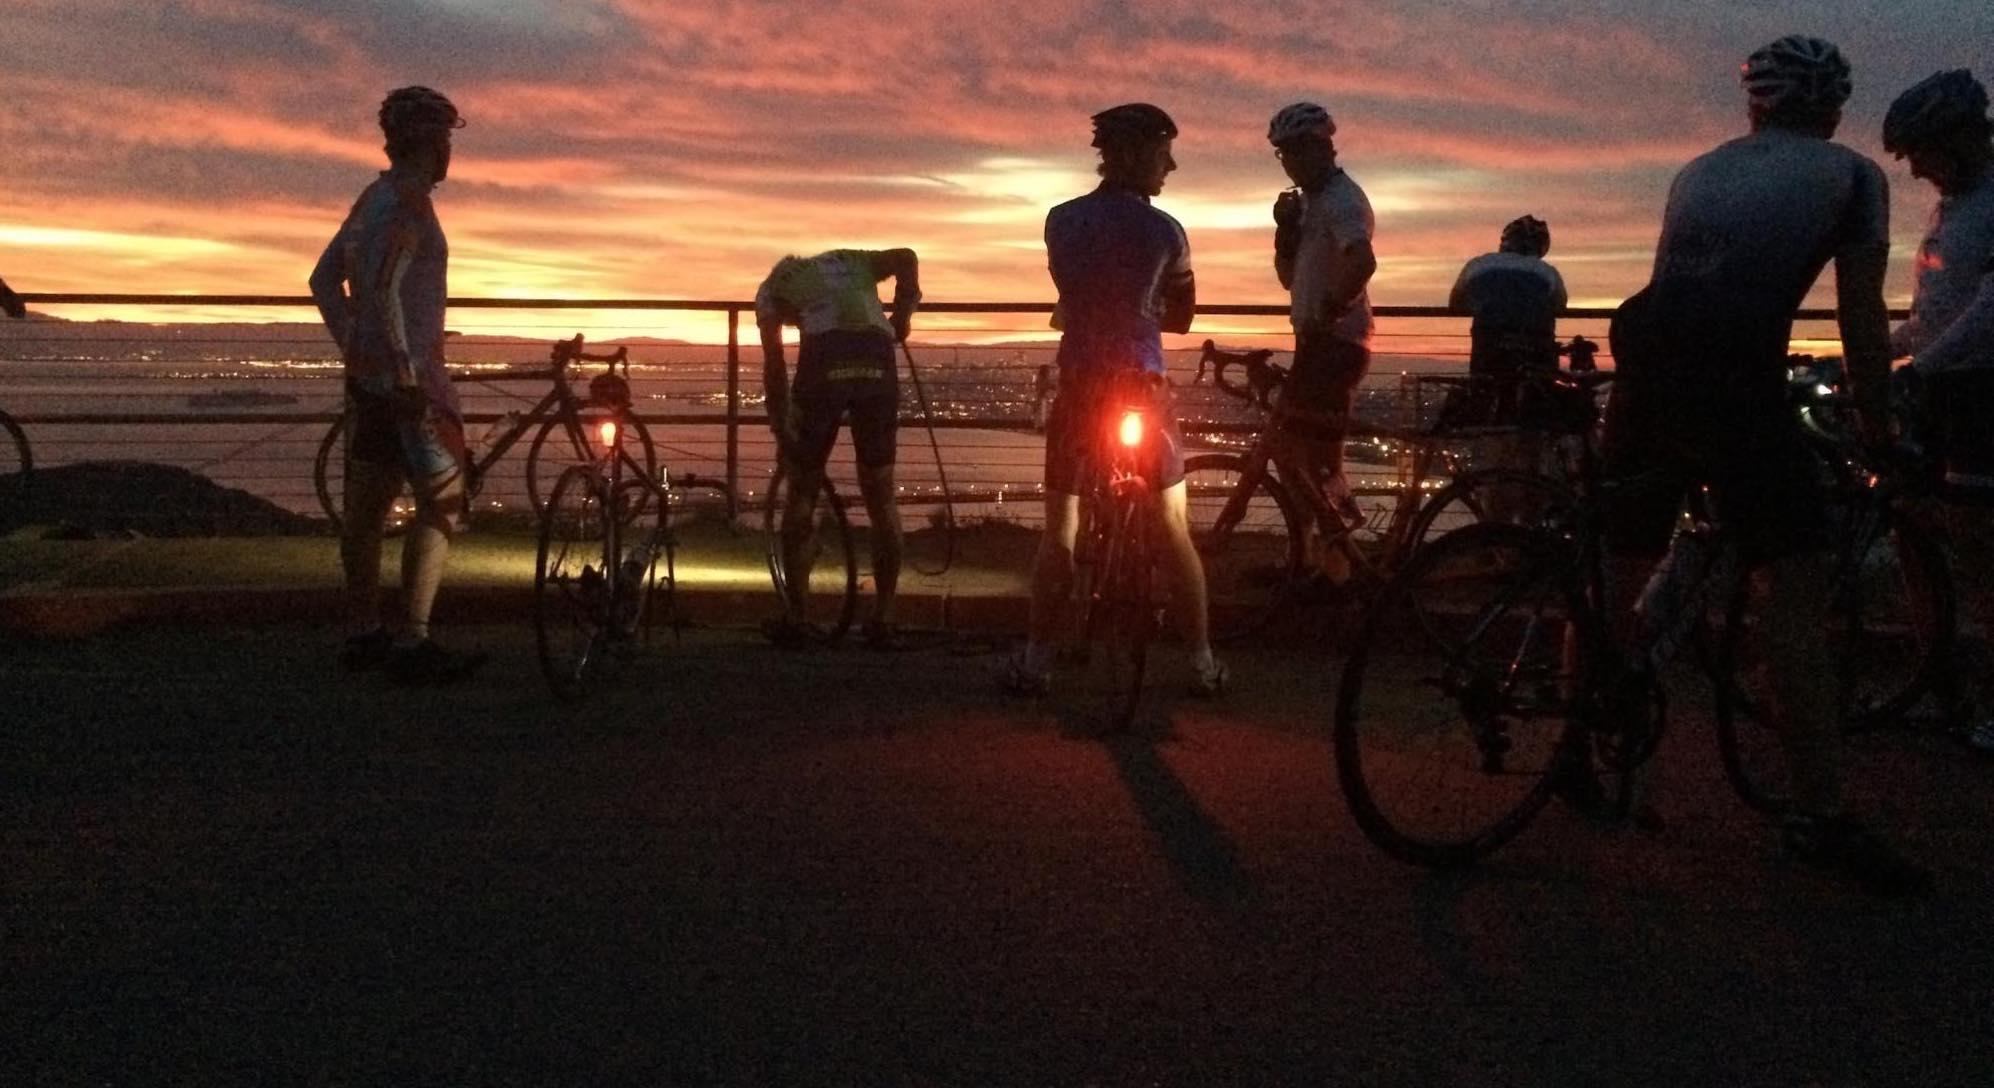 Ken_MacInnis_Sunset.jpg